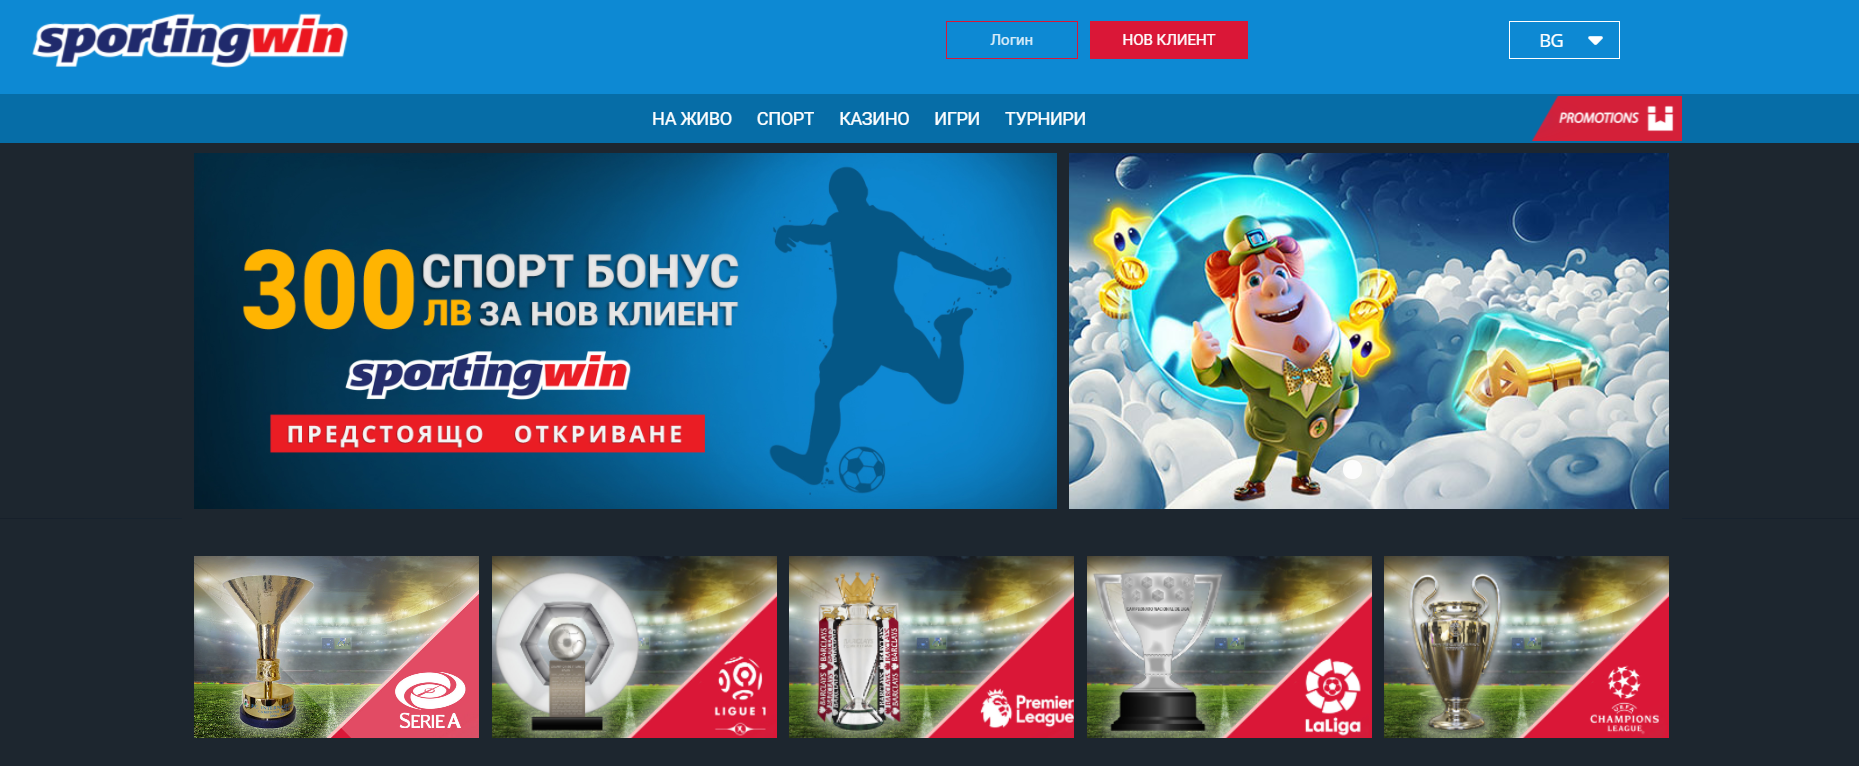 SportingWin онлайн залози